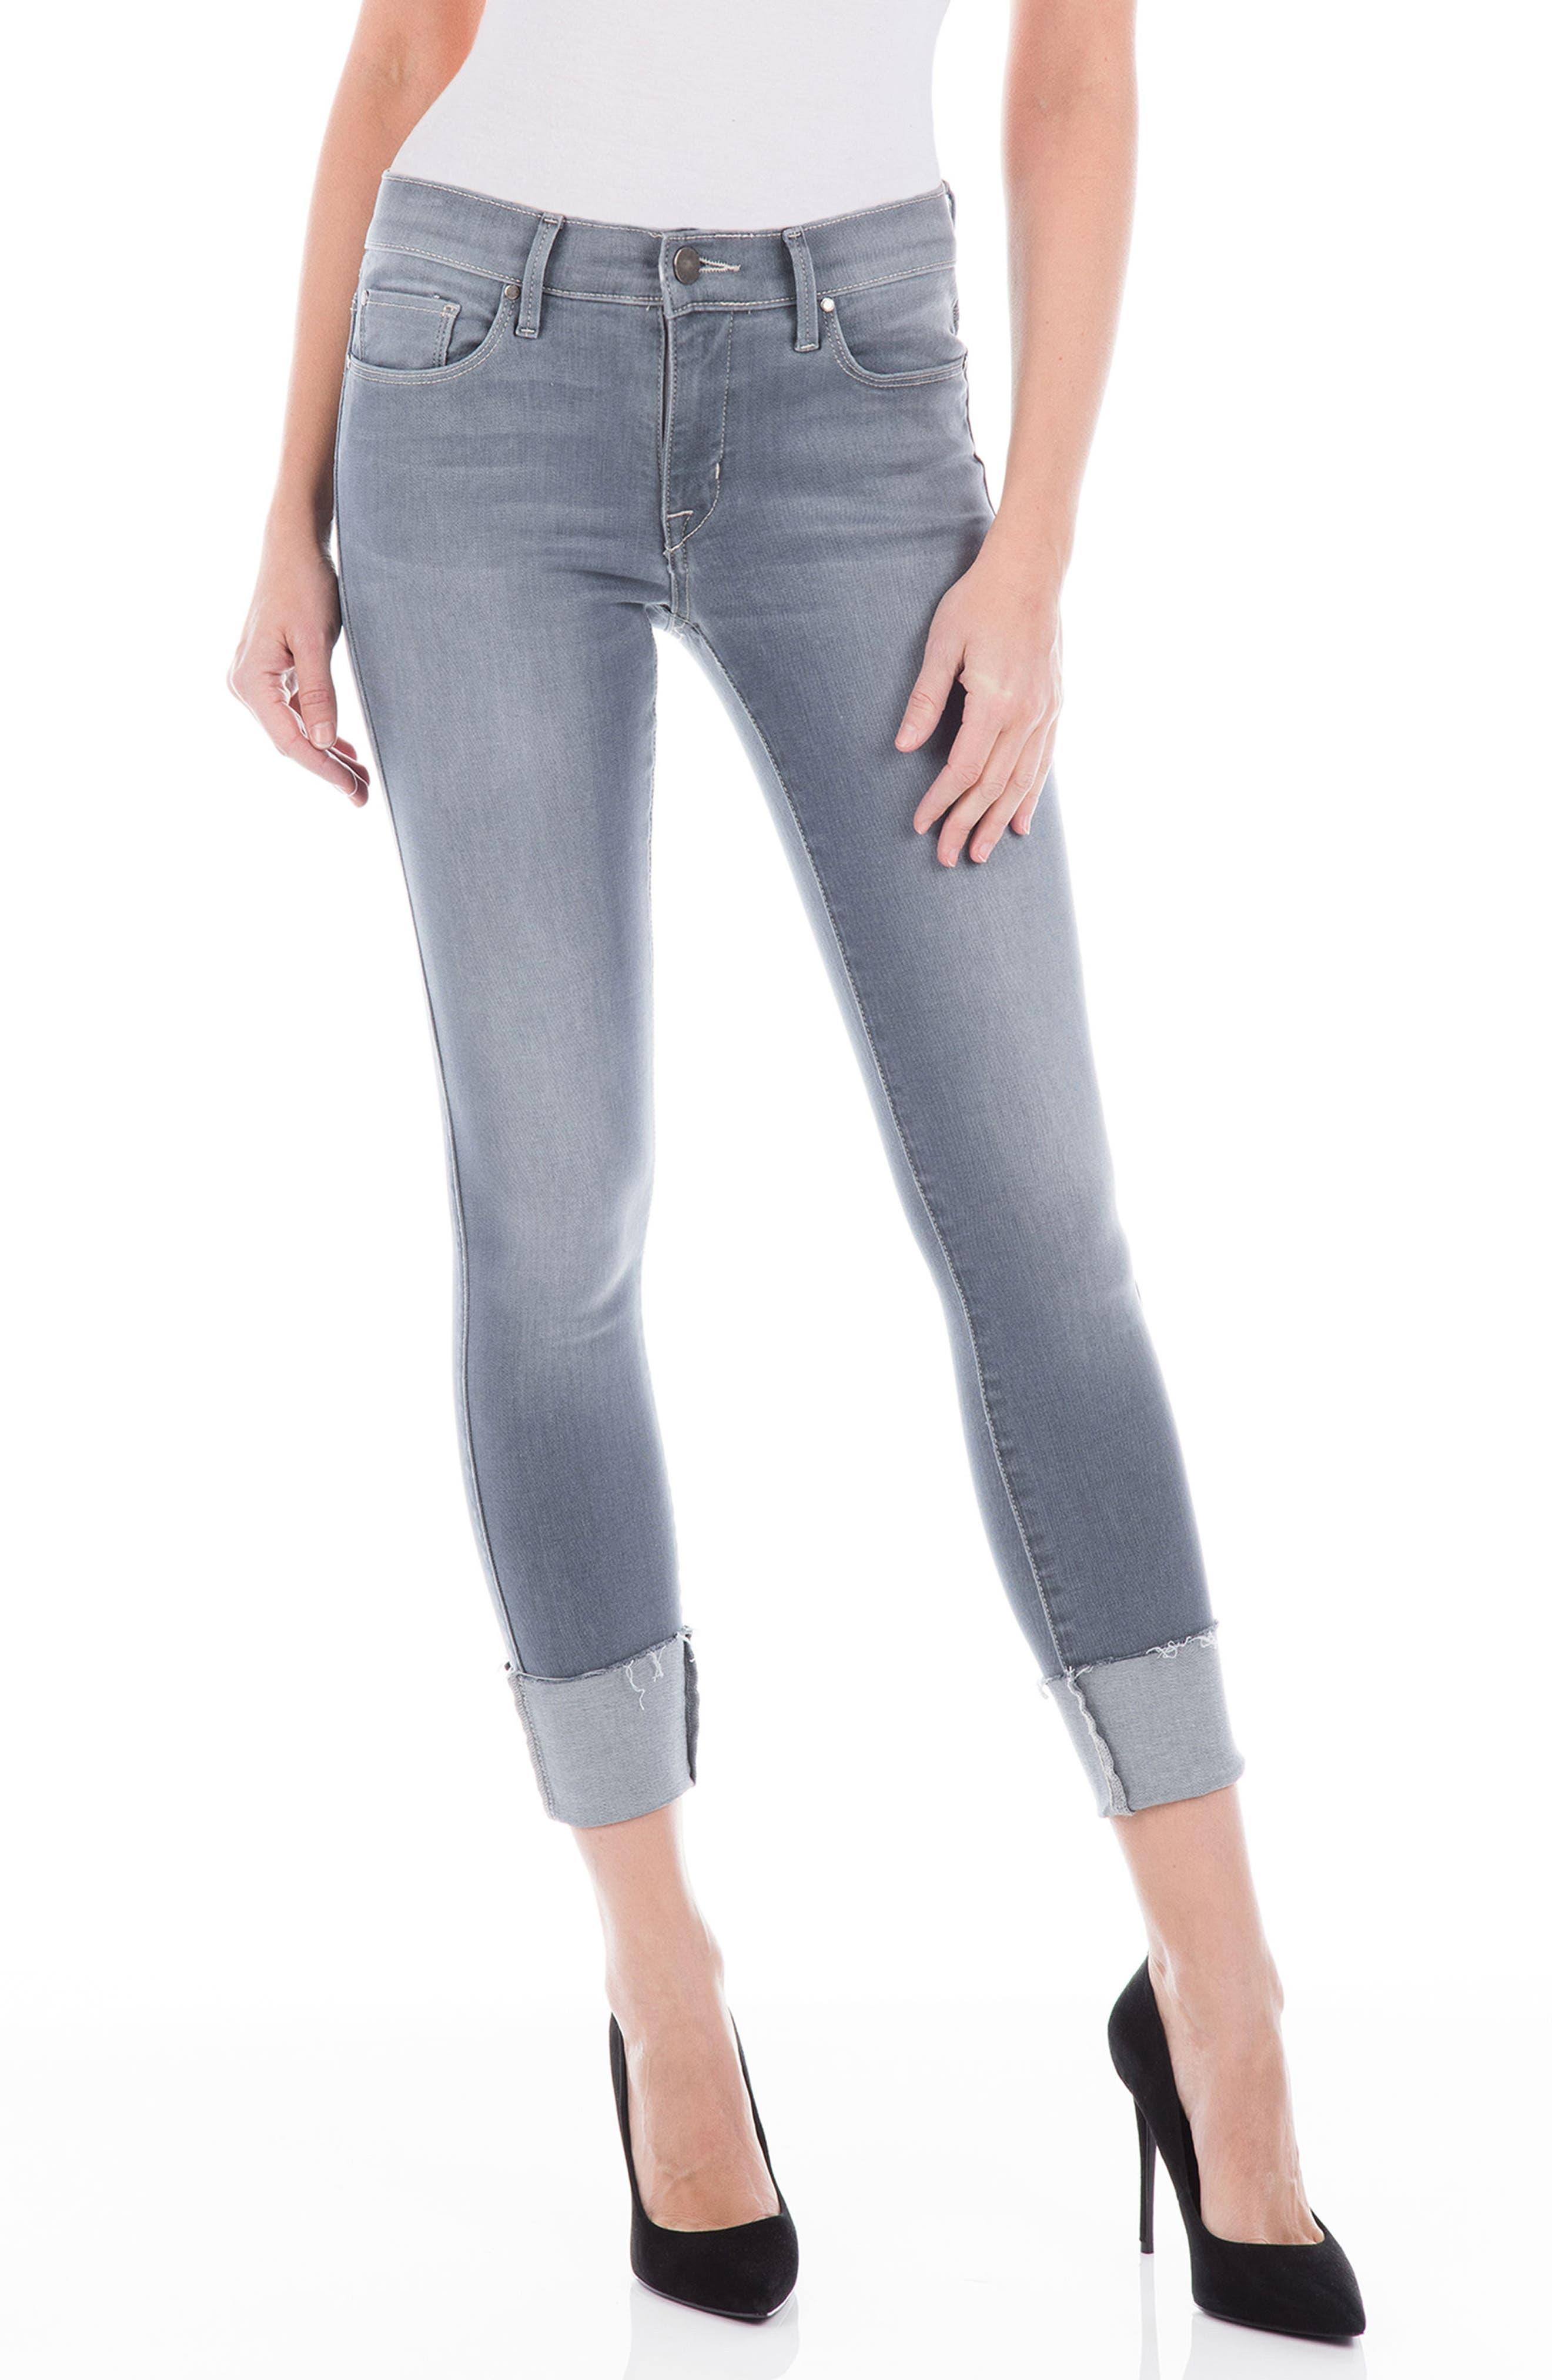 Fidelity Denim Belvedere Crop Skinny Jeans (Chrome)